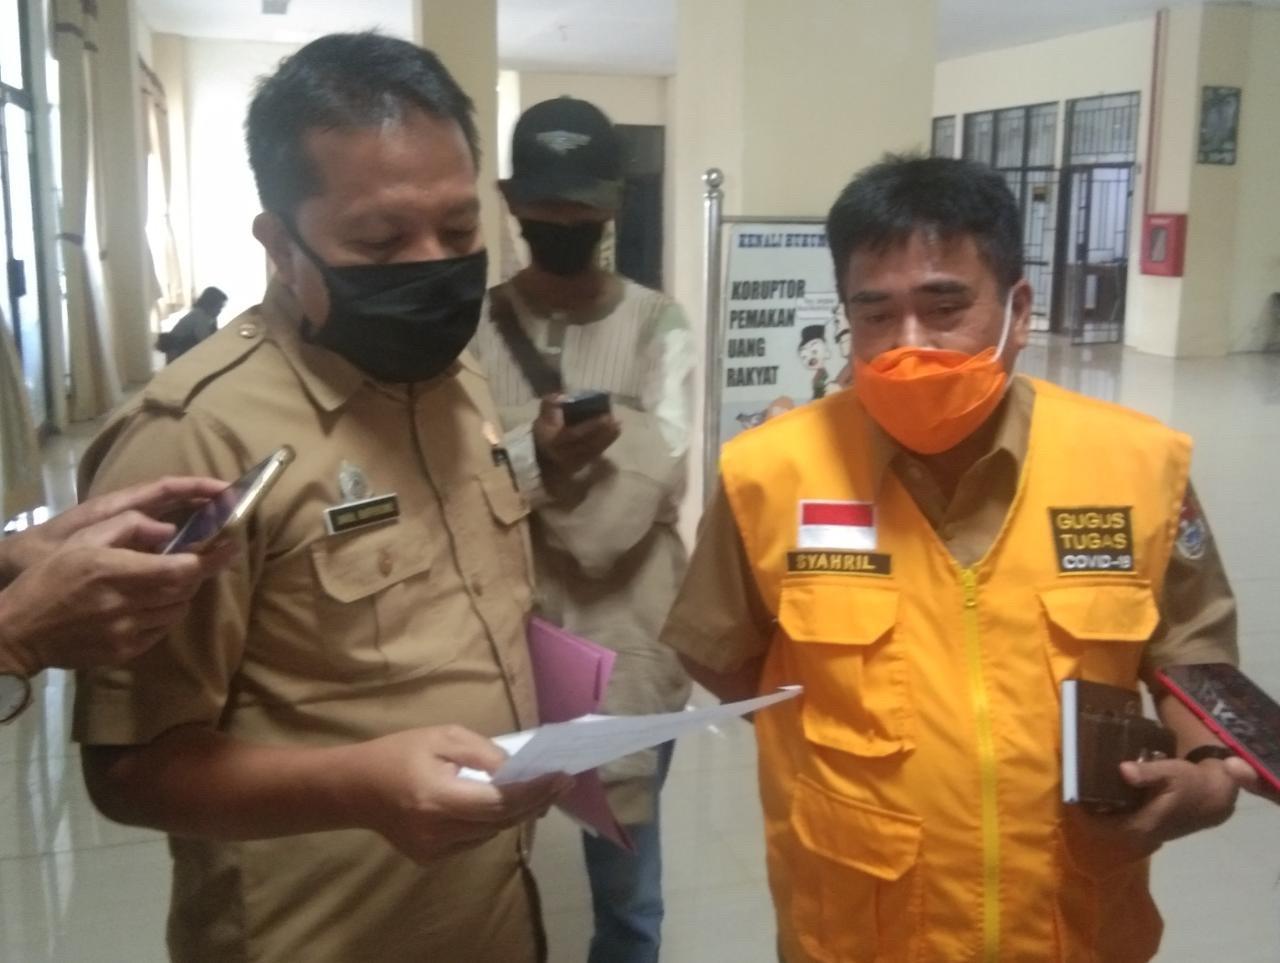 Cuma Buat Administrasi Dan Akomodasi, BPBD Kabupaten Mesuji Telan Anggaran 500 Juta